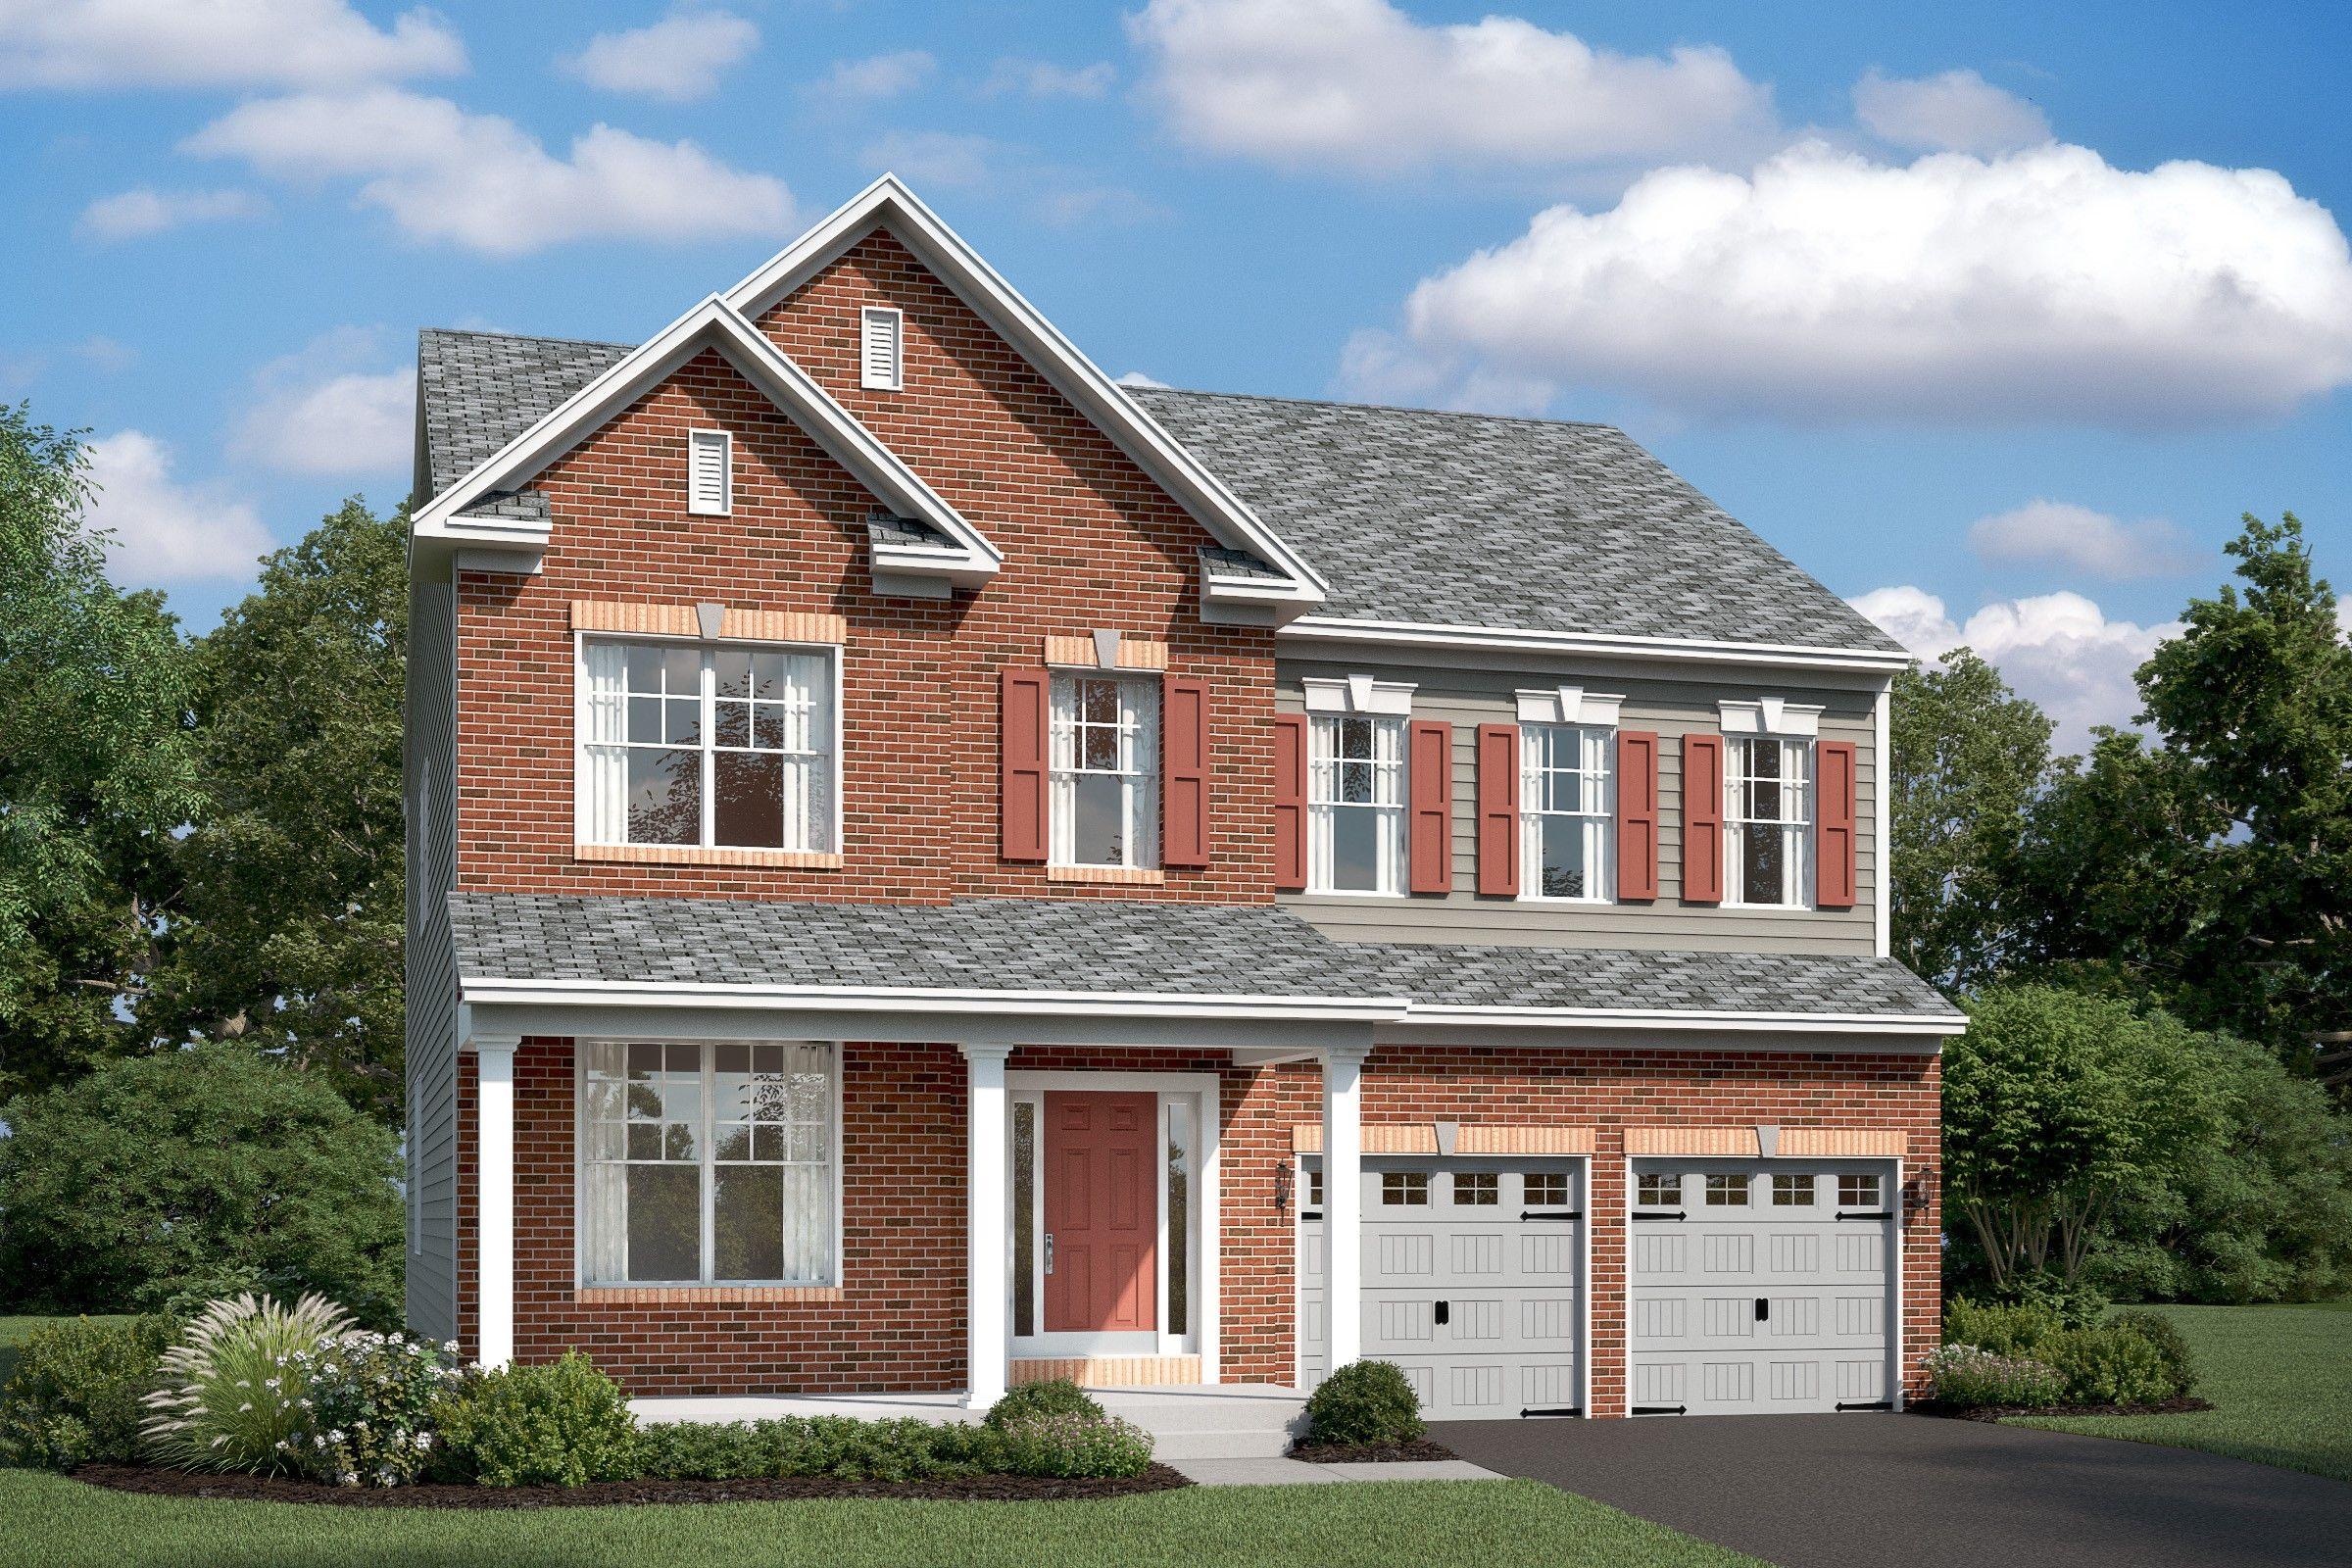 Single Family for Active at Stone Mill - Callahan Ii 7904 Meridian Drive Pasadena, Maryland 21122 United States